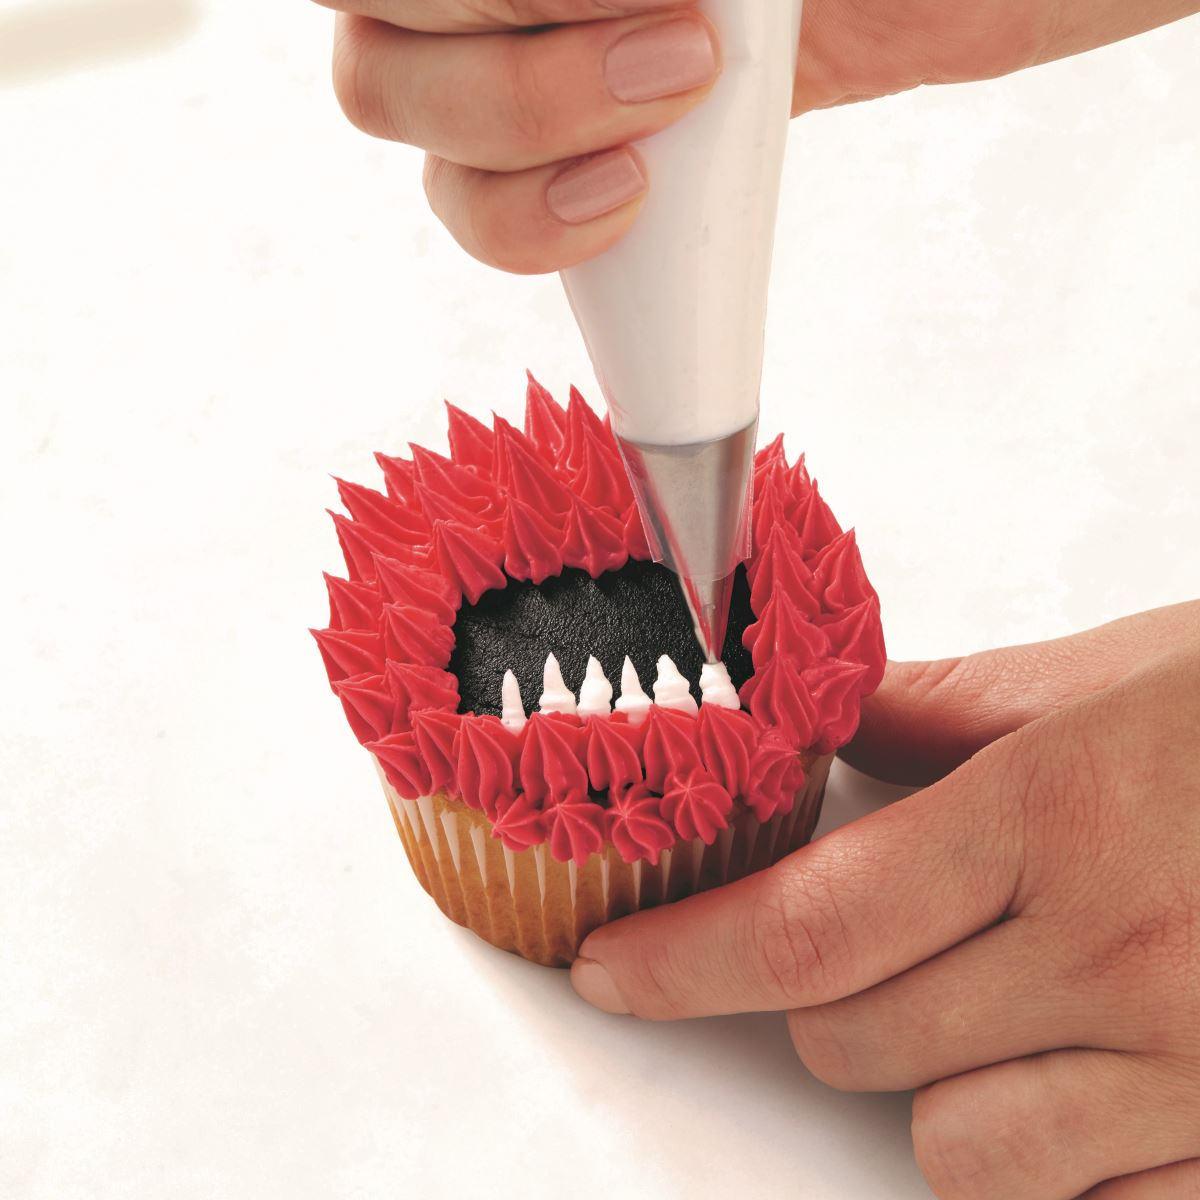 PINK ONE-EYED MONSTER CUPCAKE step 3